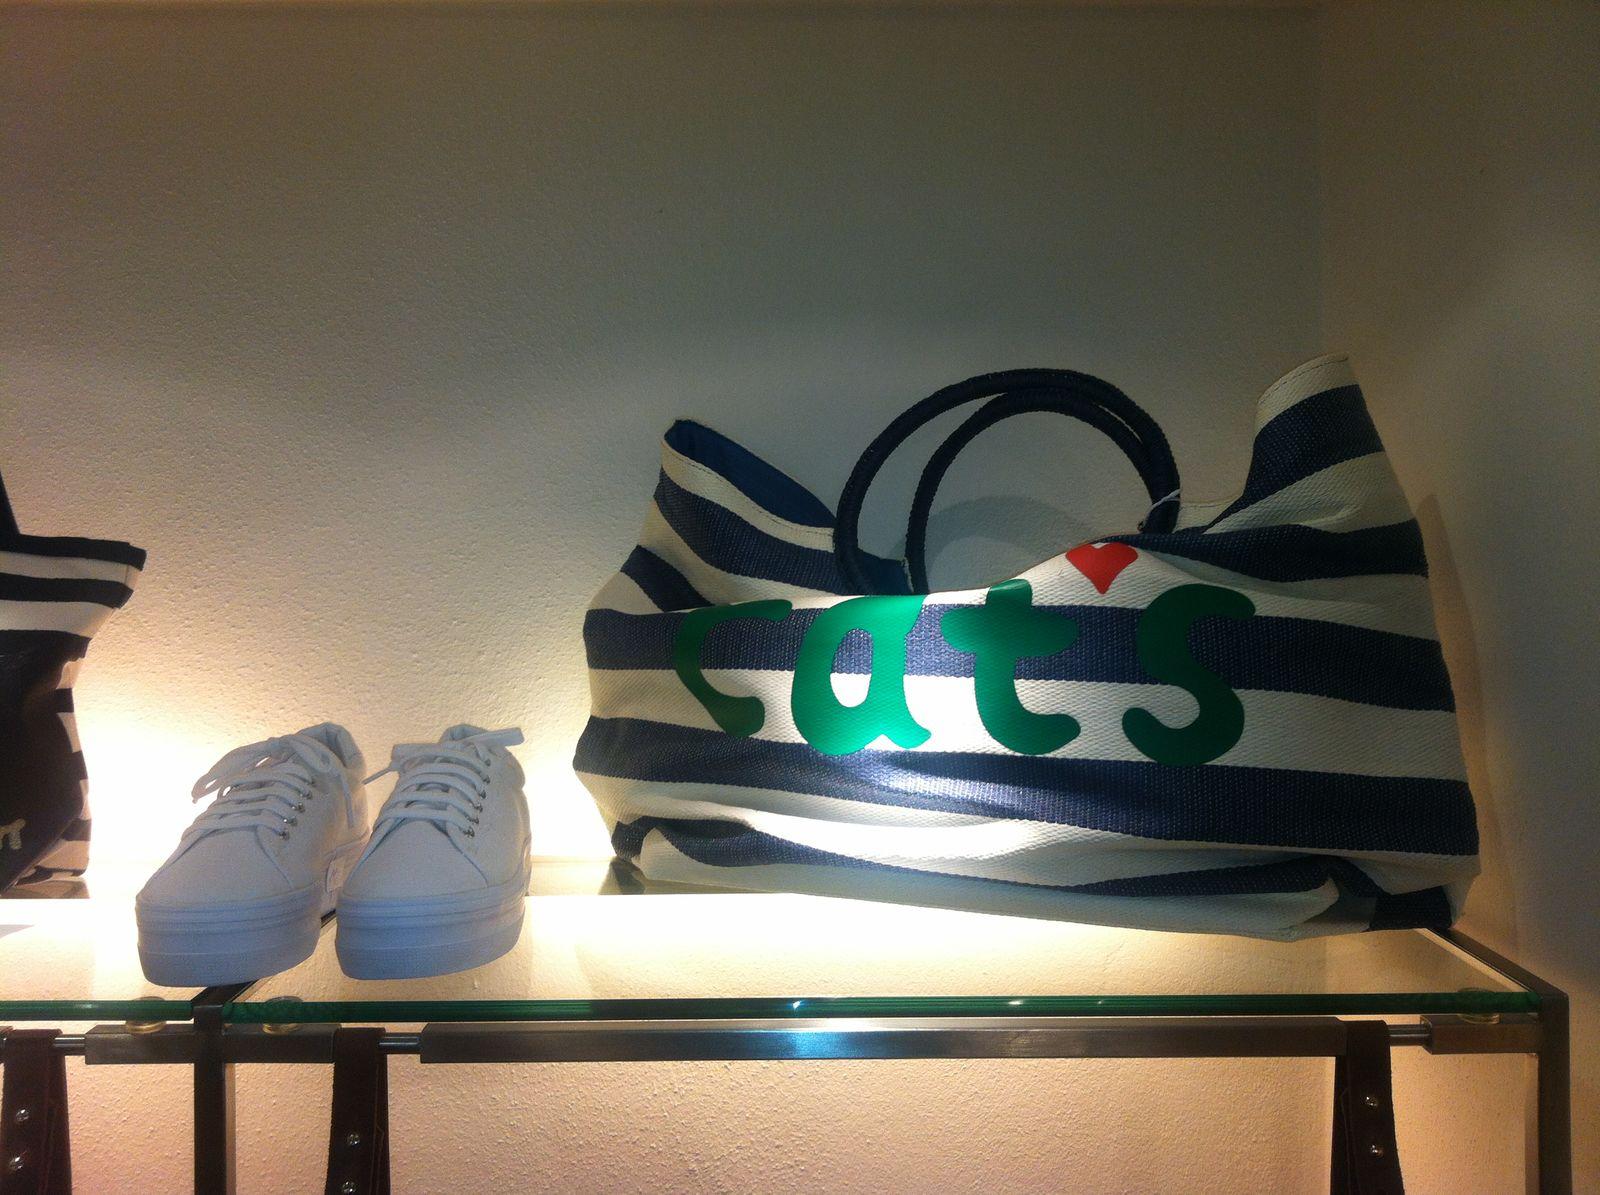 ROSSO Mode & Schuhe Prien am Chiemsee in Prien (Bild 3)